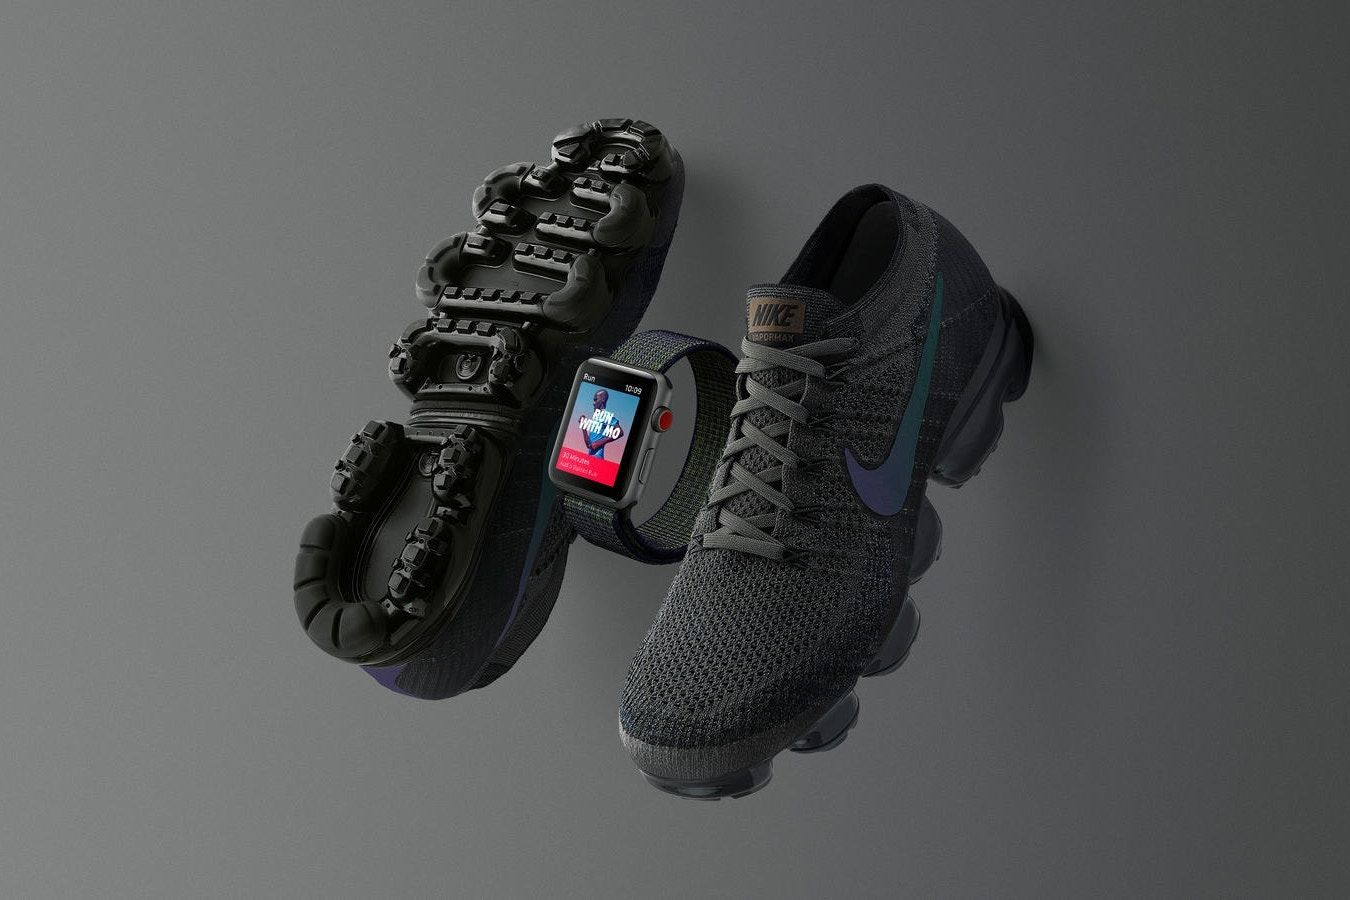 42d3a53c3bea Nike Air Vapormax Midnight Fog」